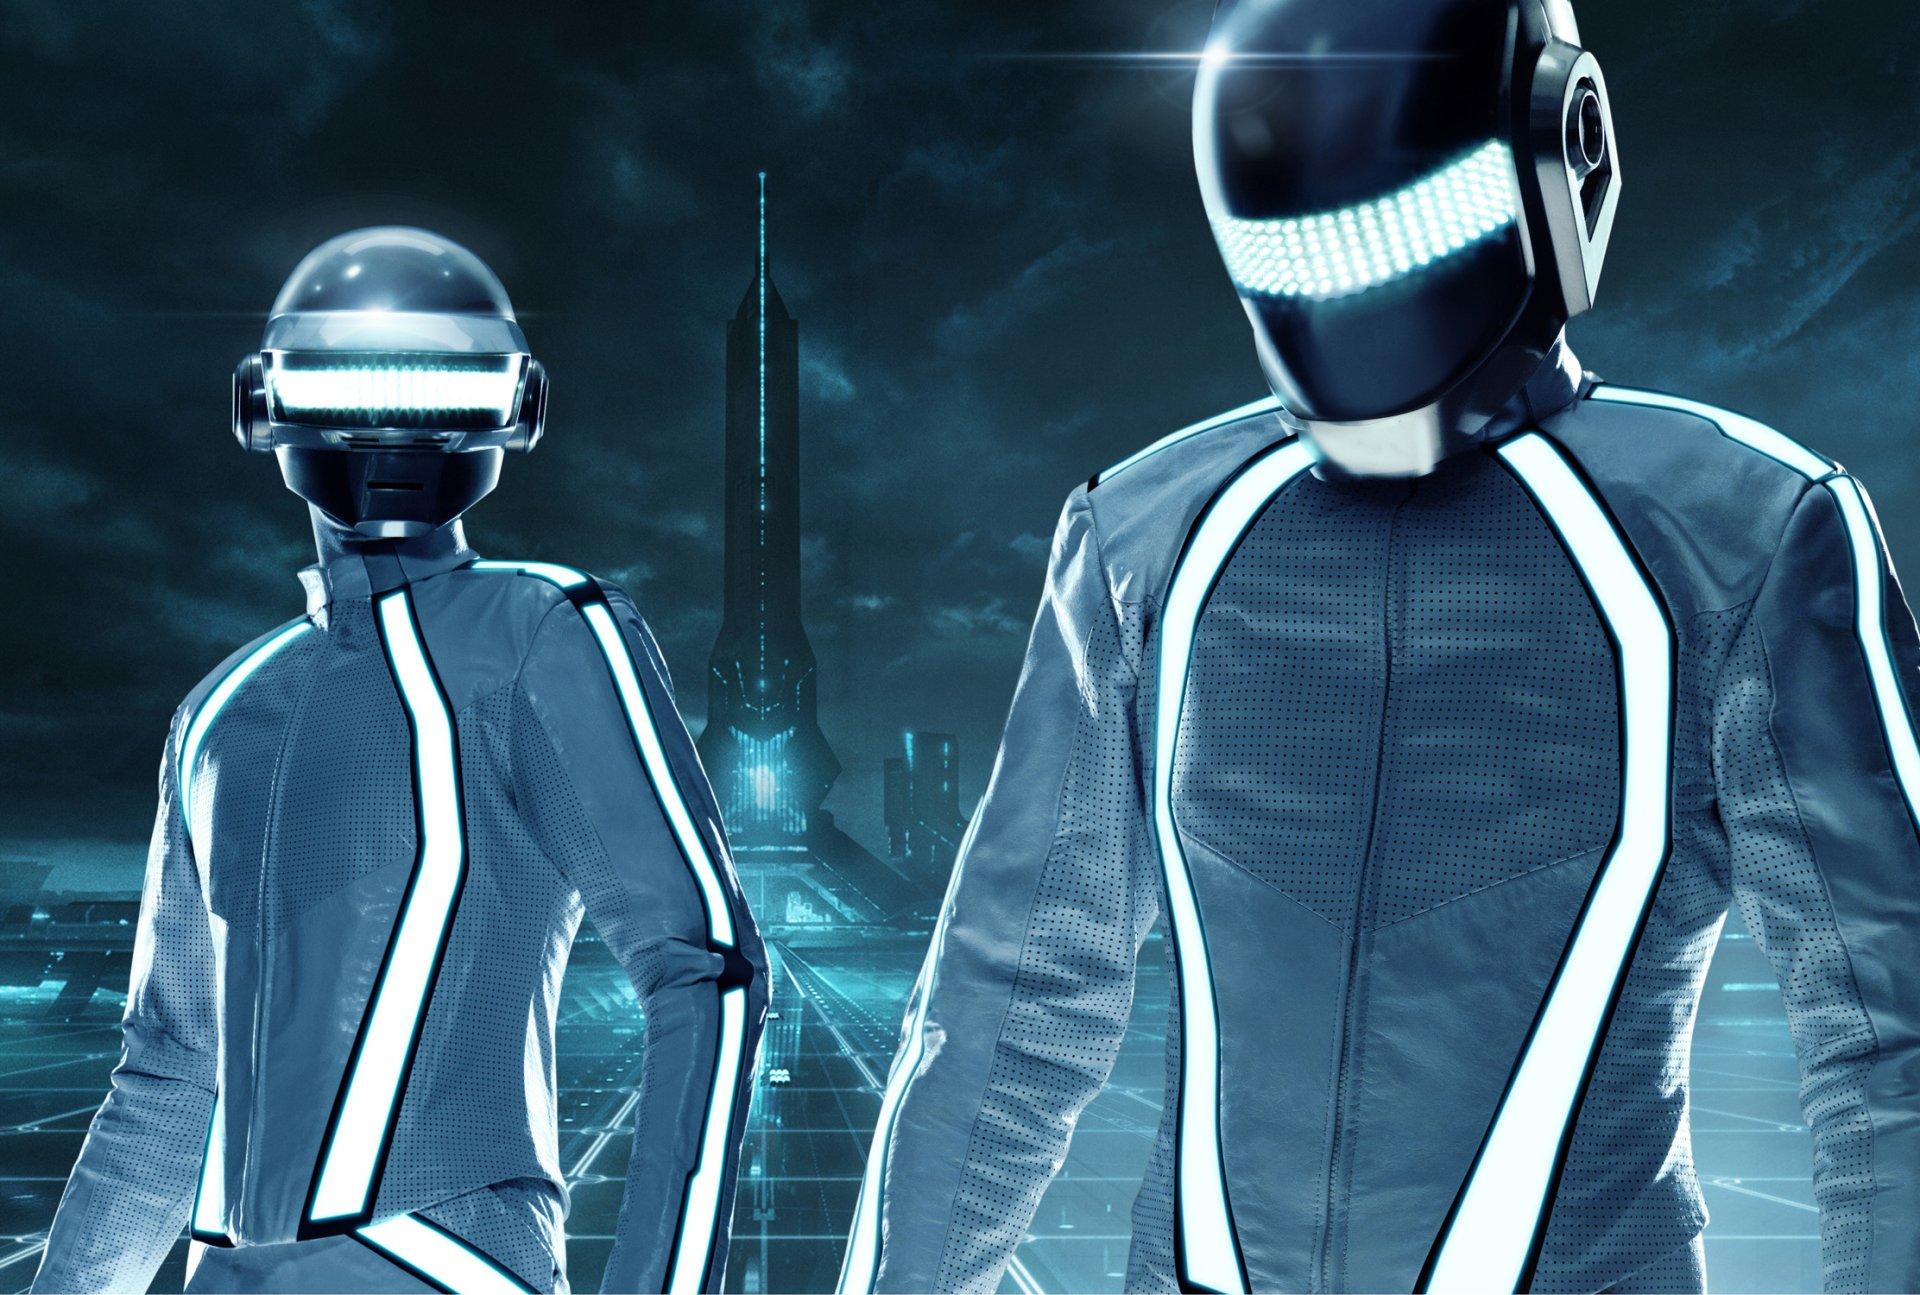 Musik - Daft Punk  Bakgrund